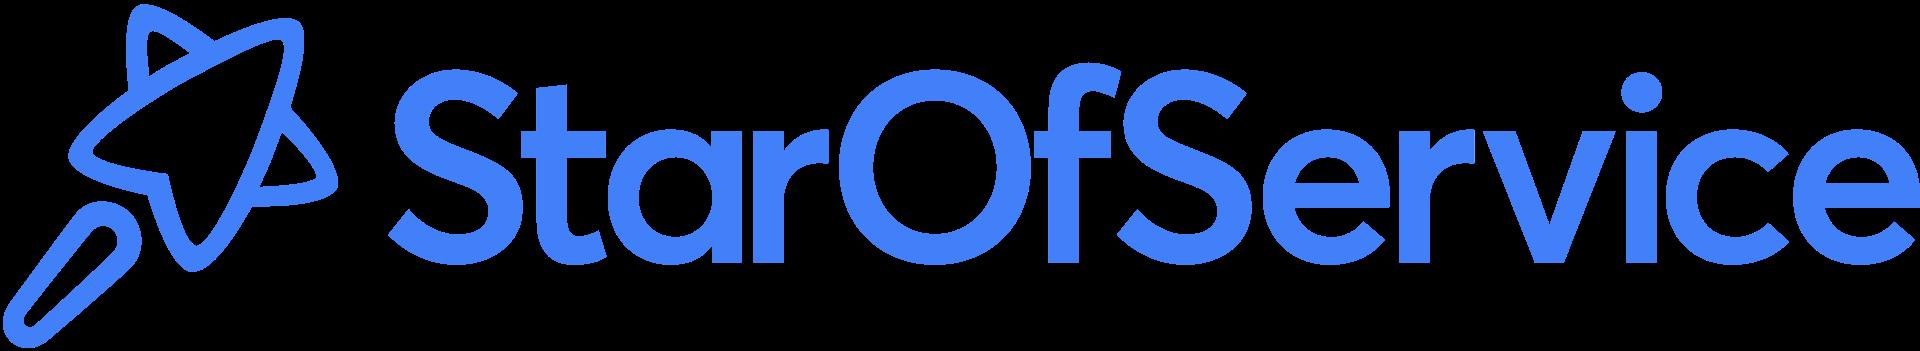 StarOfService | EU-Startups